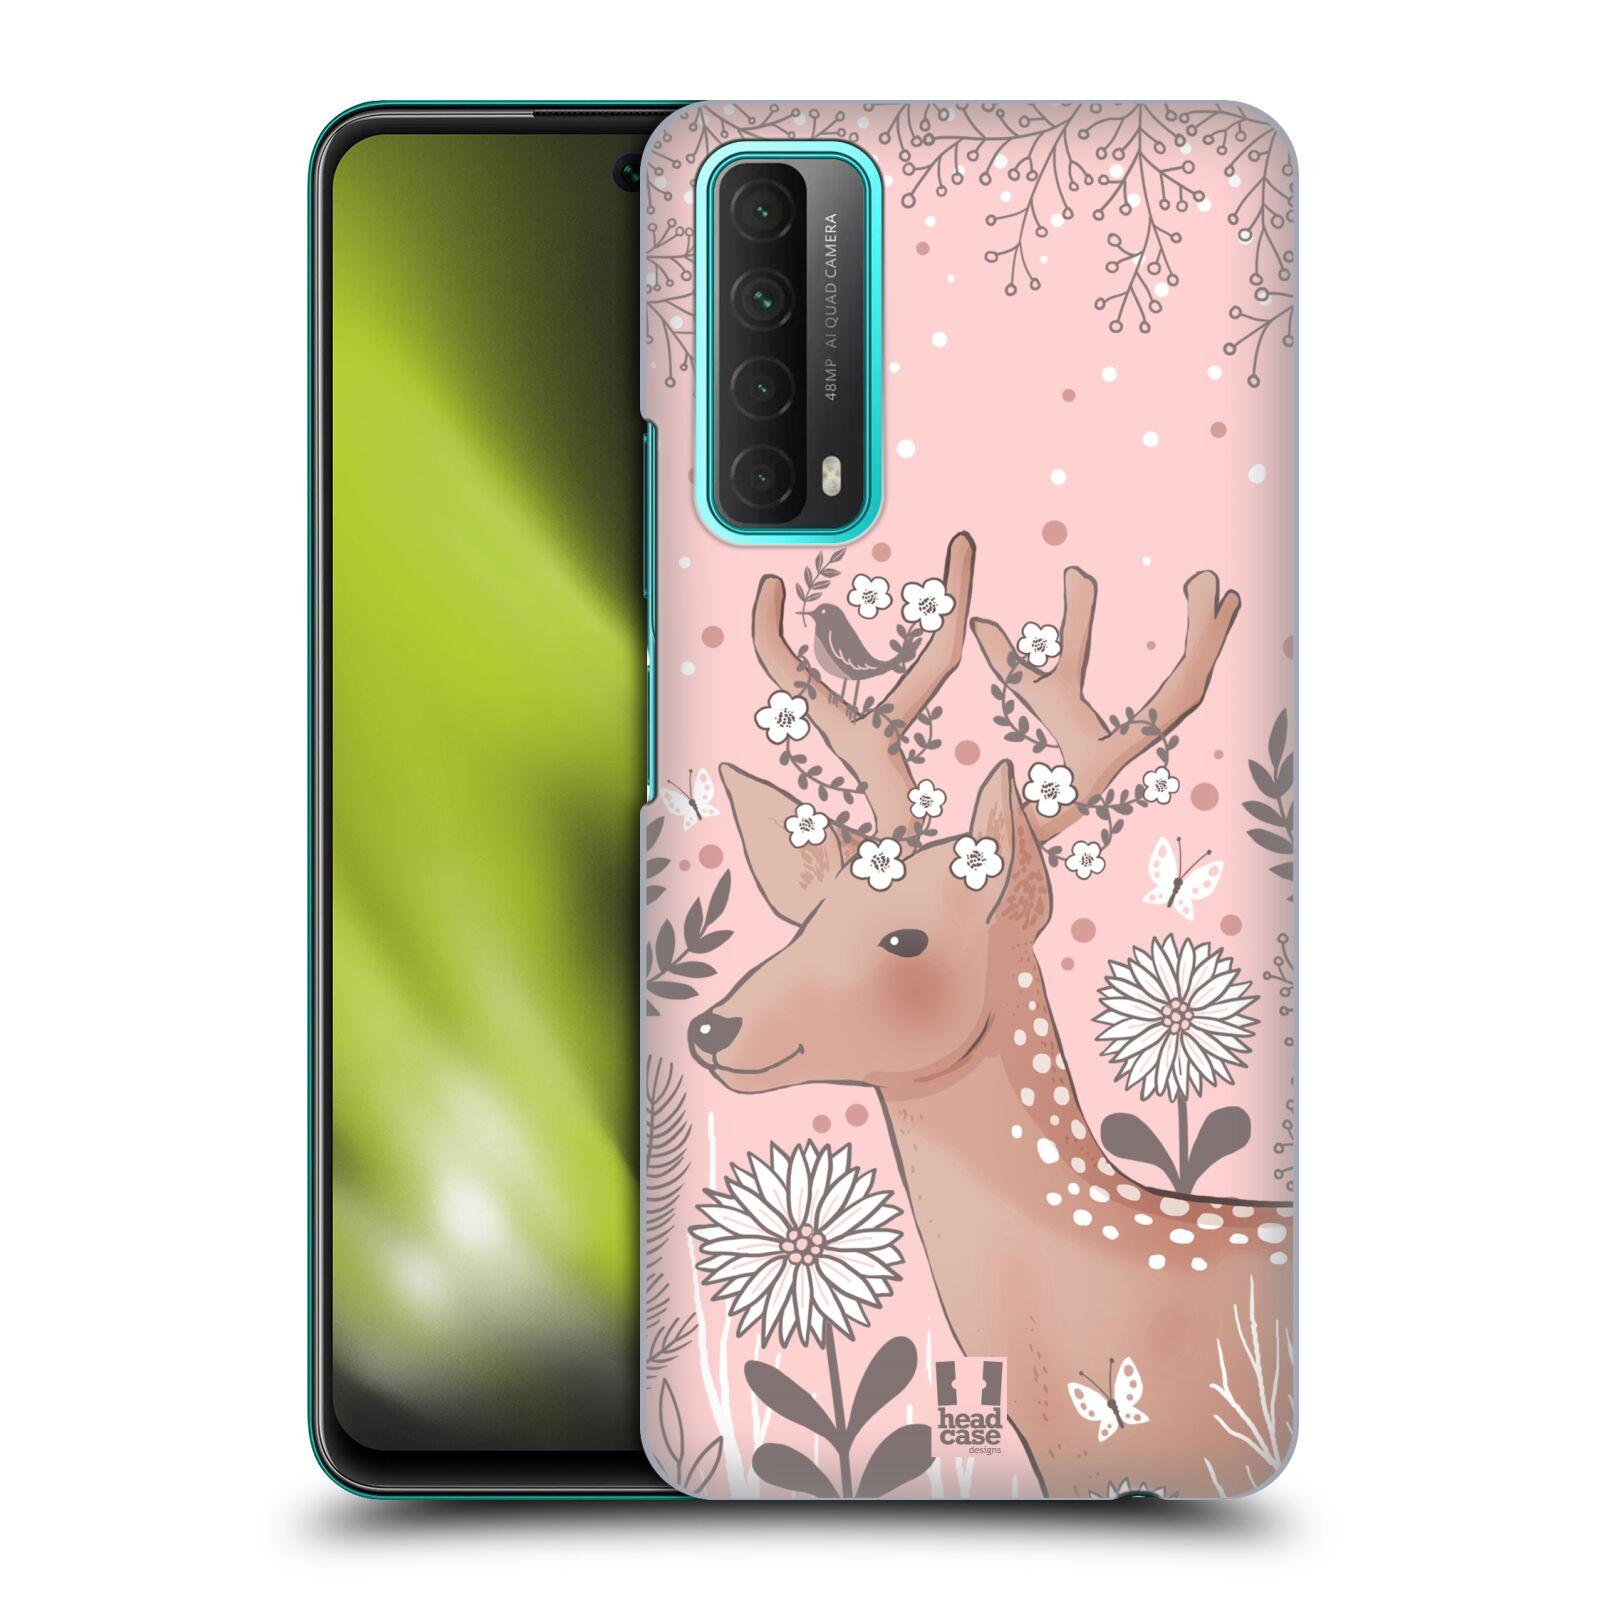 Plastové pouzdro na mobil Huawei P Smart (2021) - Head Case - Jelíneček